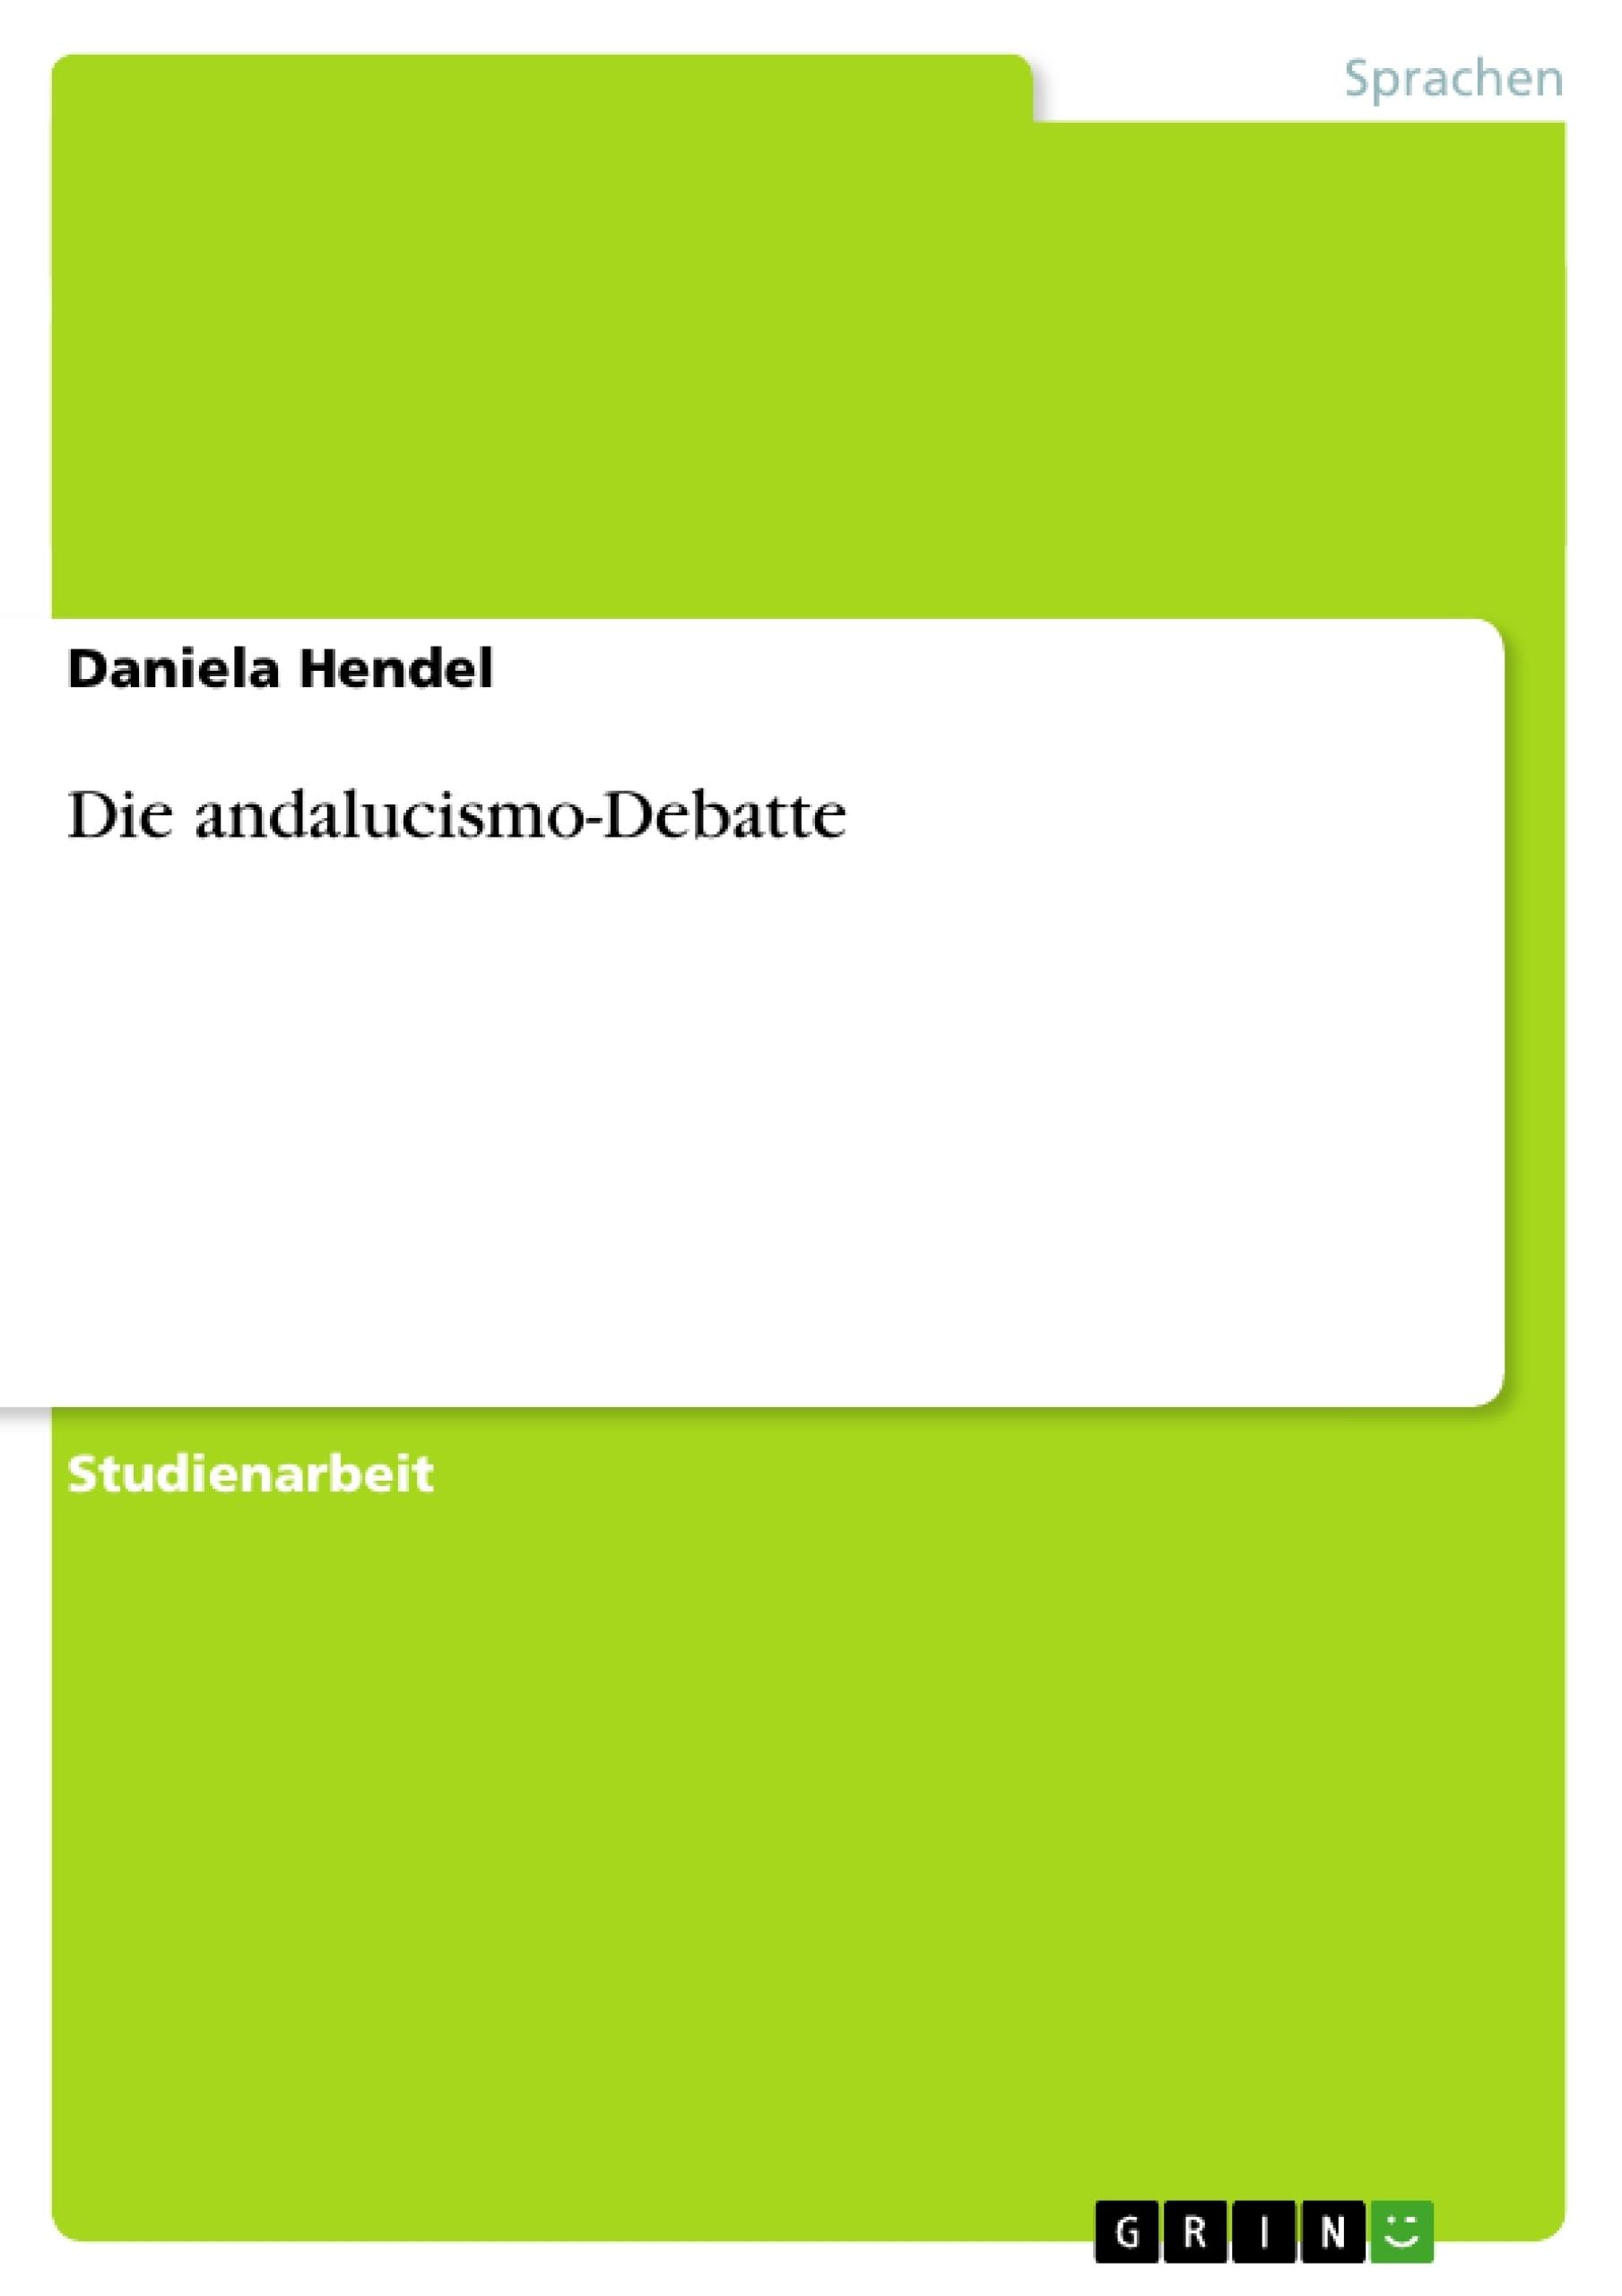 Titel: Die andalucismo-Debatte